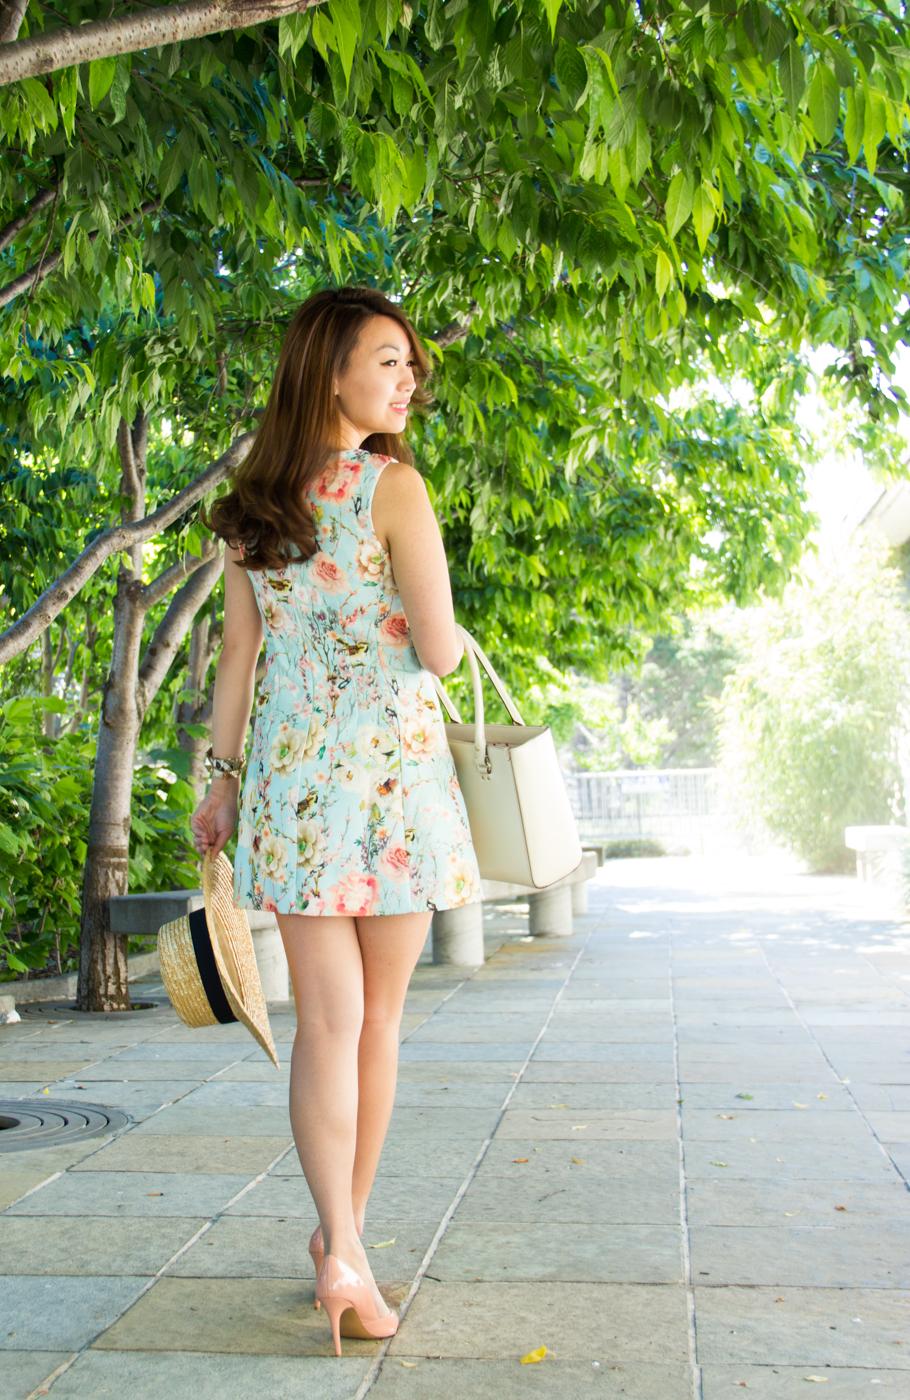 Ready to soak up the summer sun | via The Chic Diary